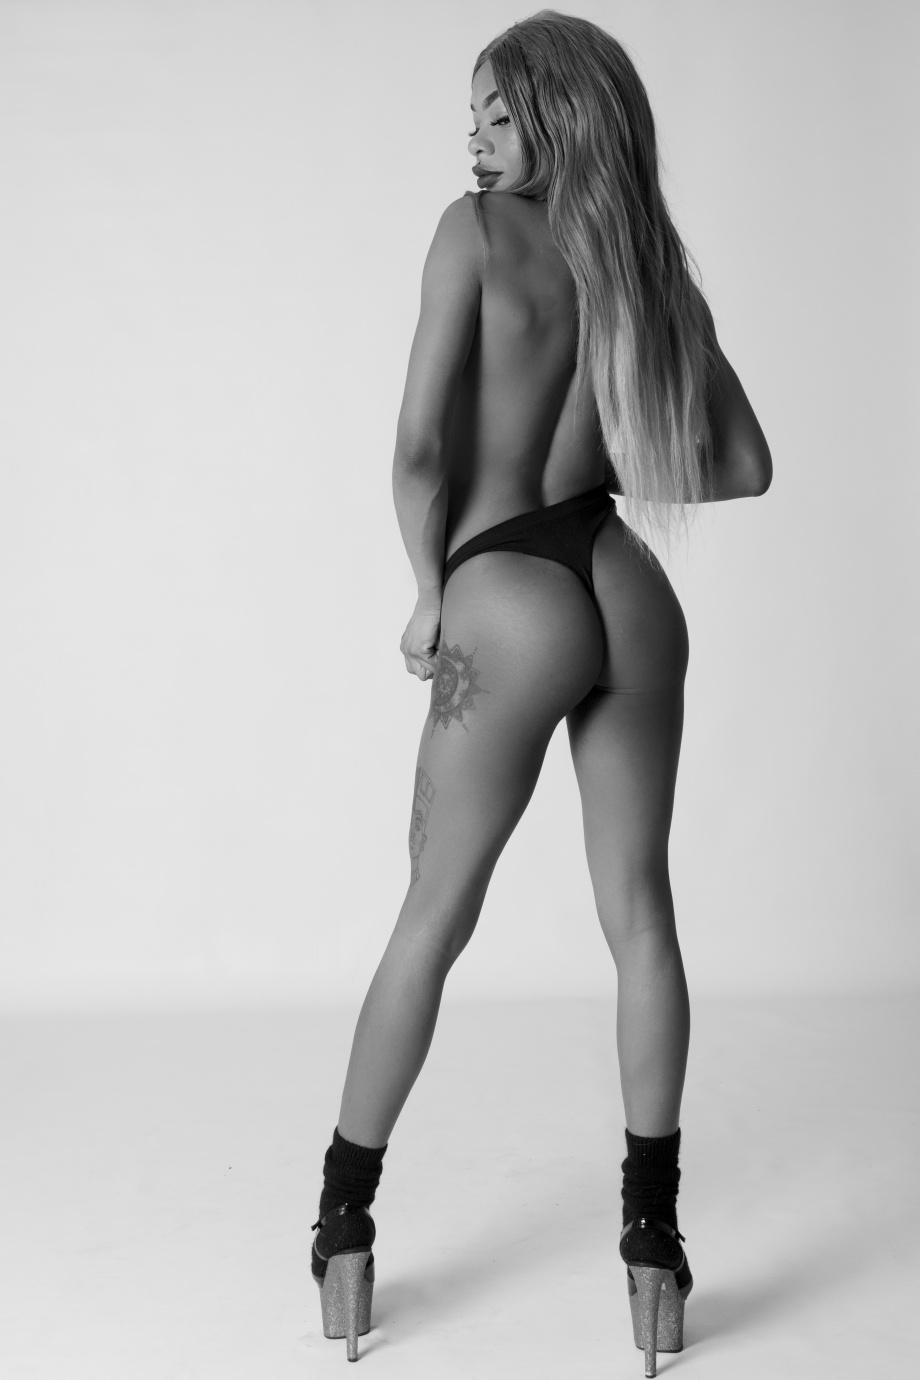 cork, glamour, photography, Ireland, boudoir, black and white, studio shoot, nude, topless